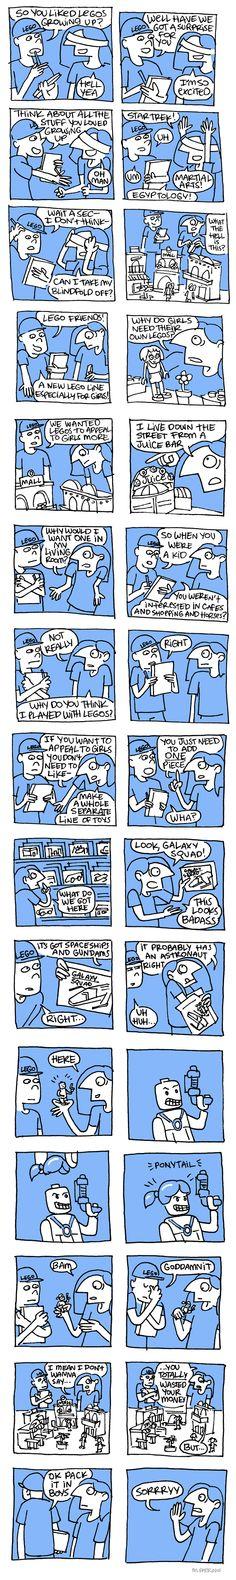 """LEGO Friends"" by Maritsa Patrinos of Seasonal Depression."